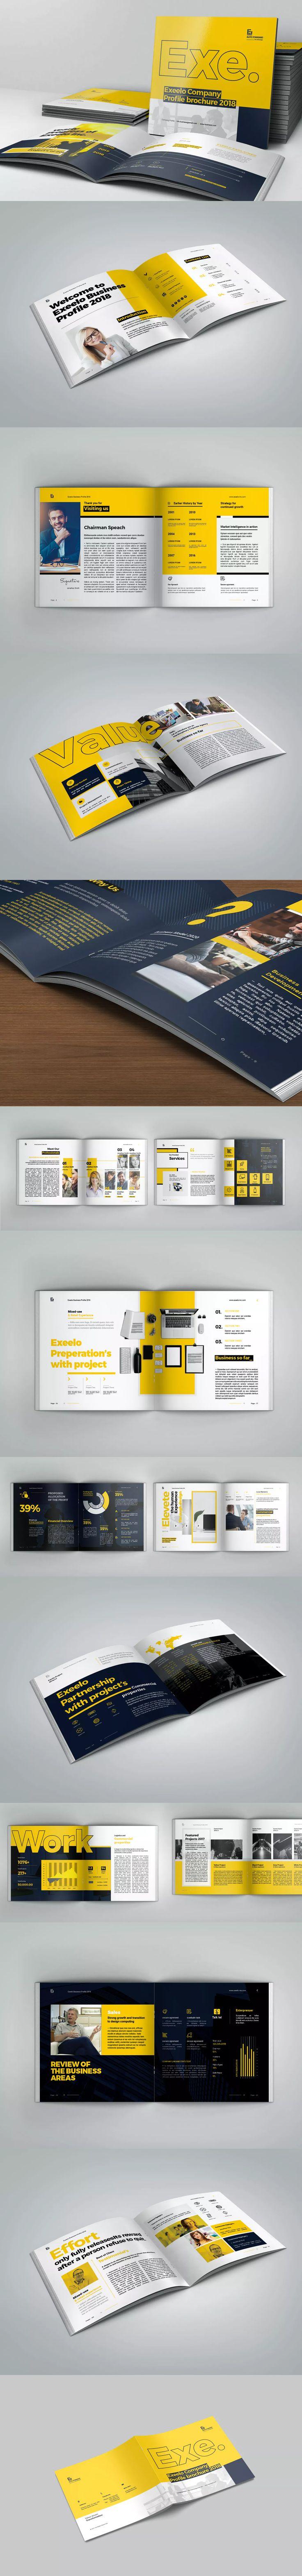 Square Company Profile Template InDesign INDD - A4